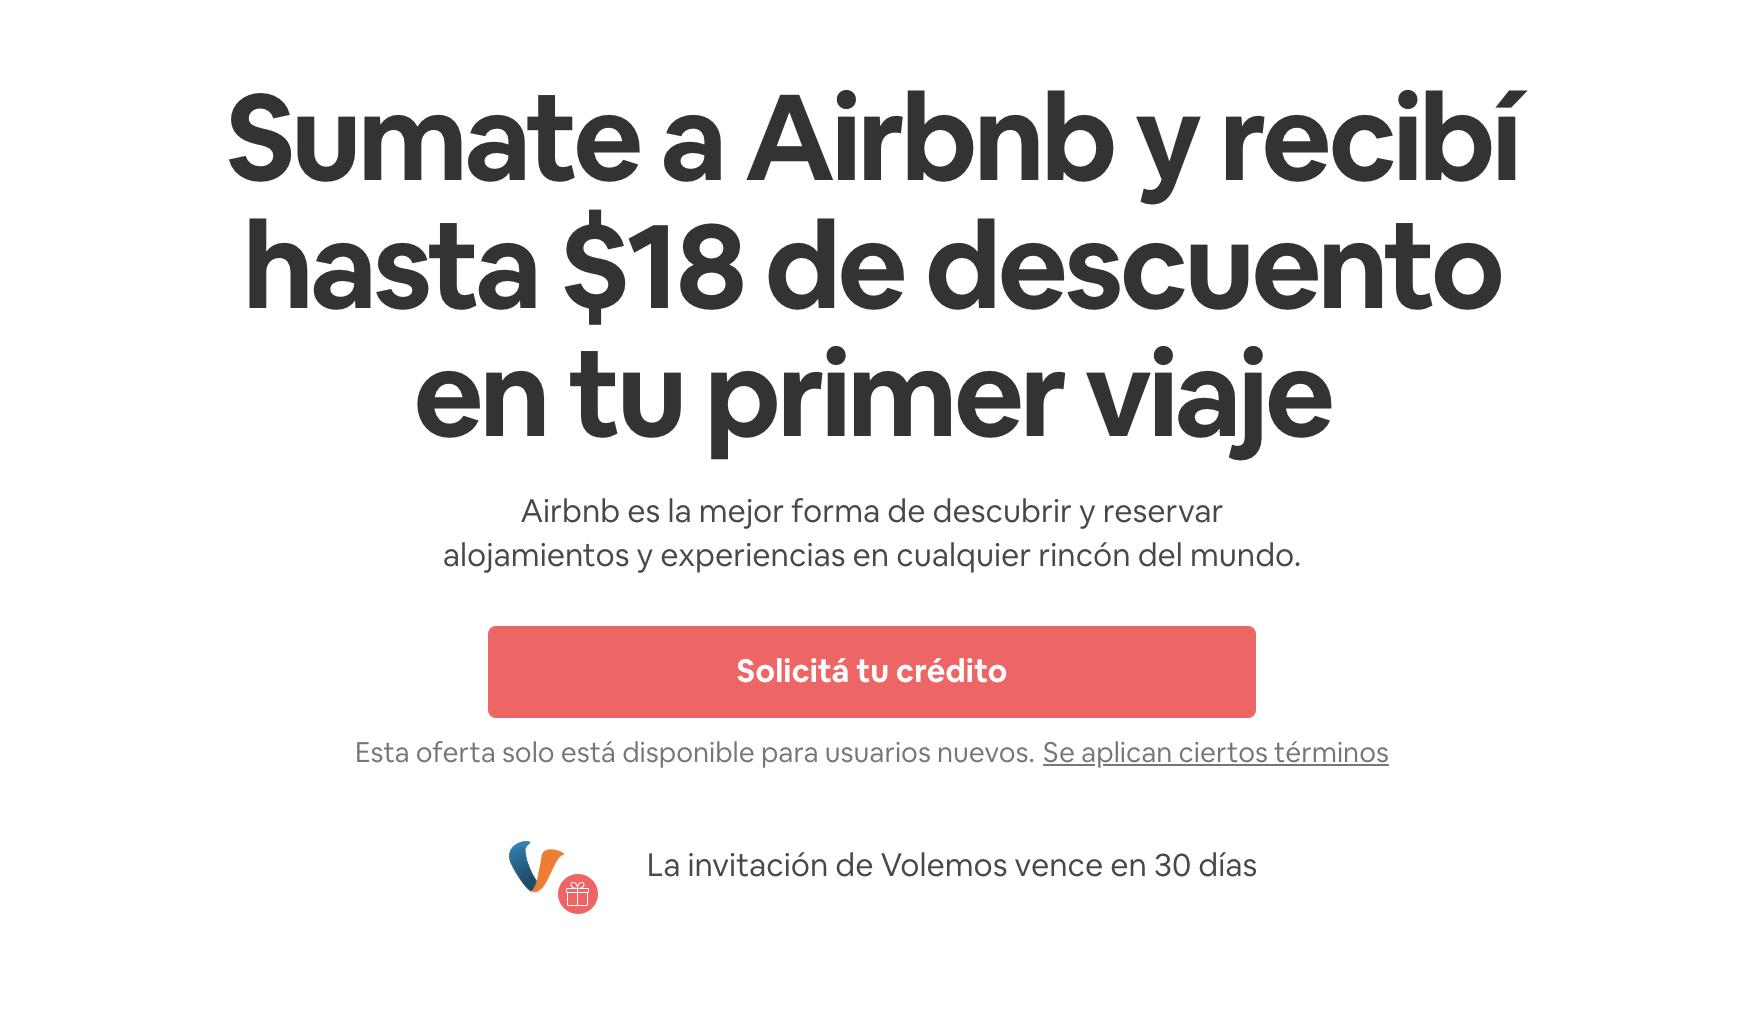 Credito gratis para airbnb